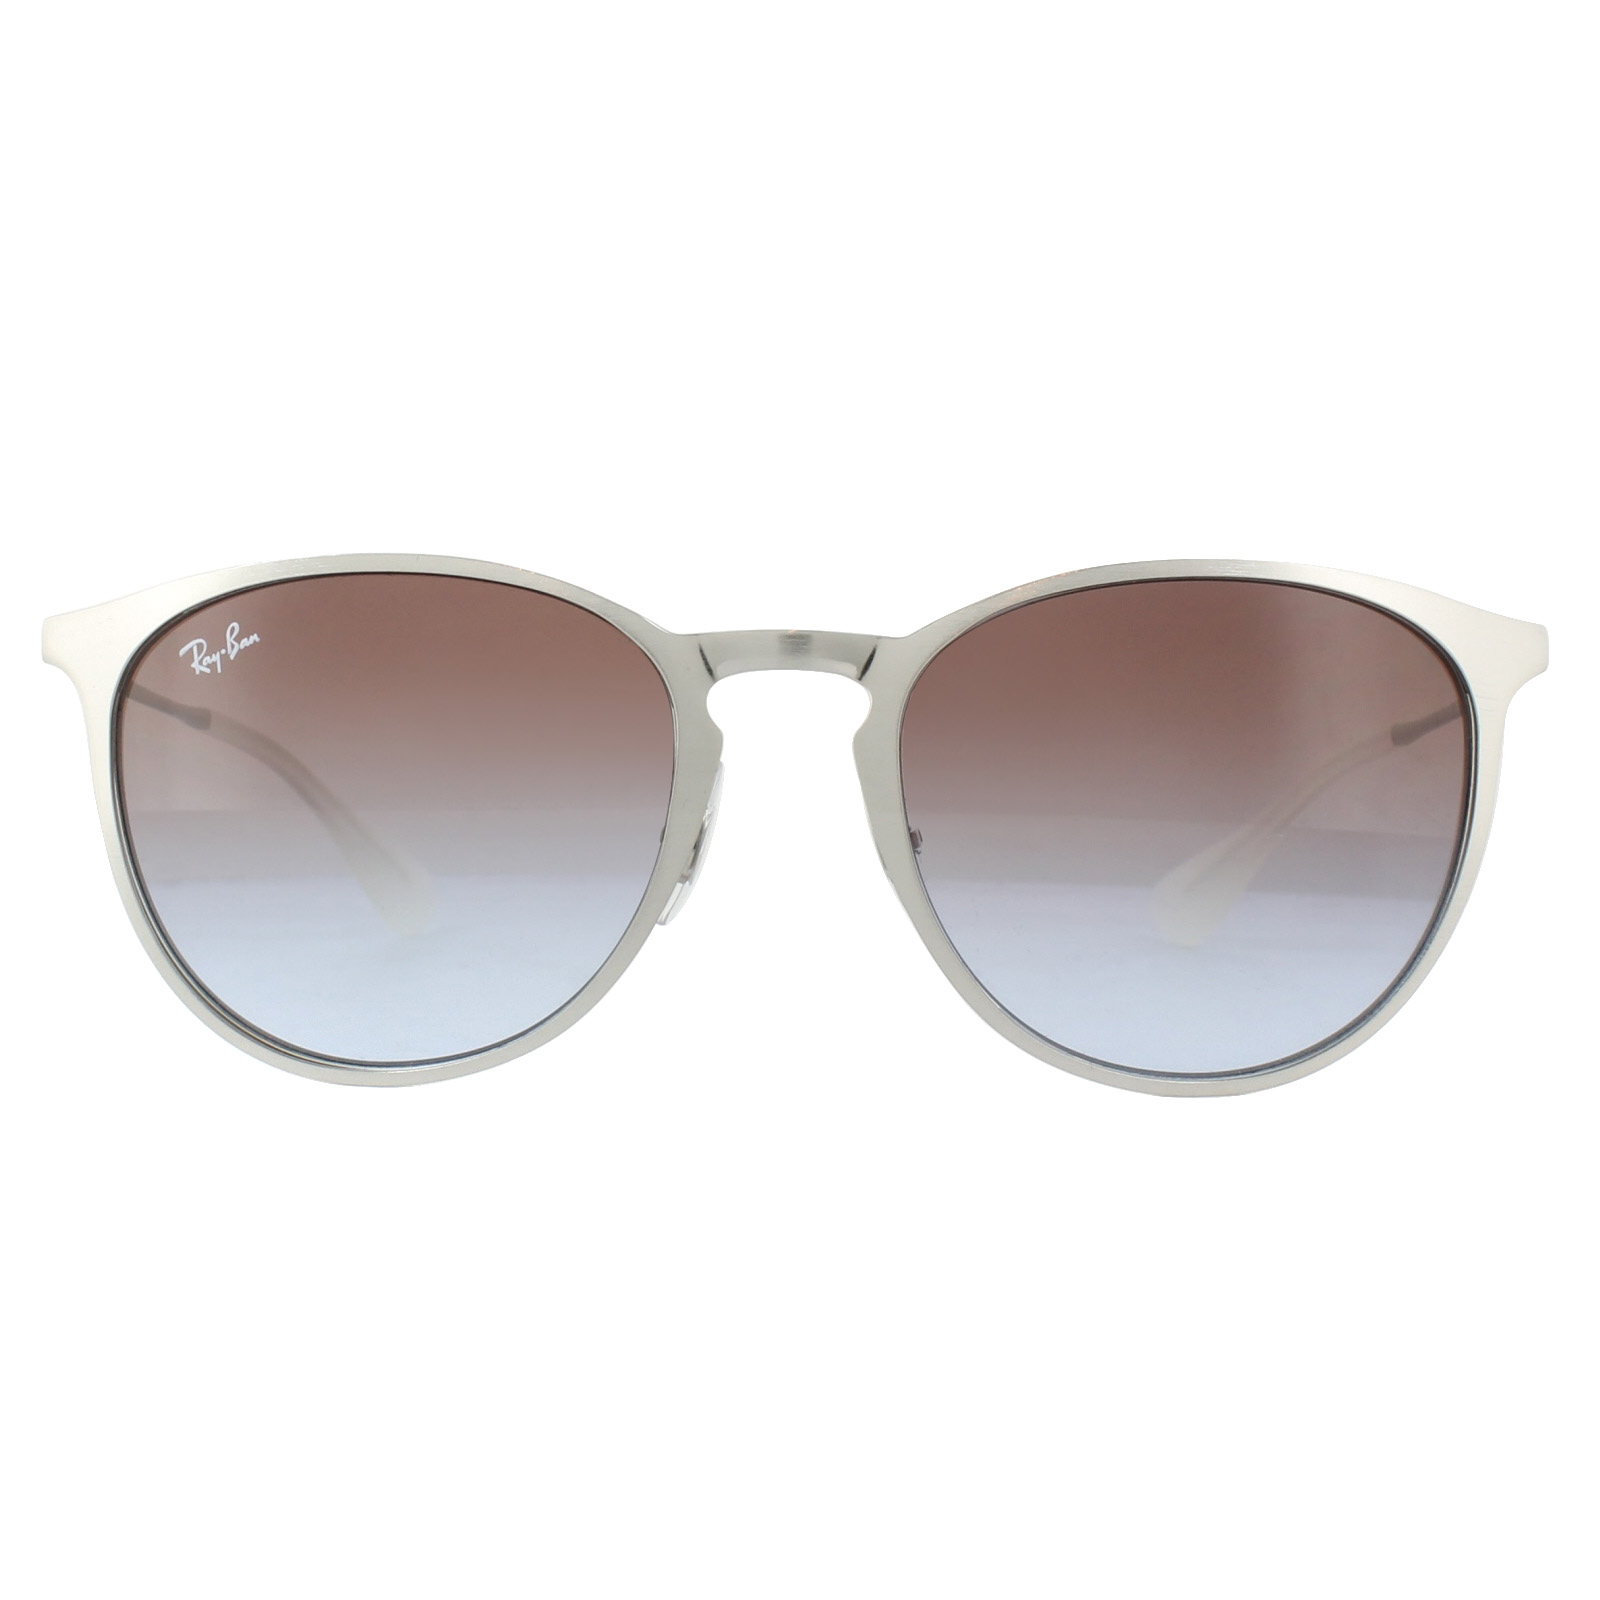 84bbae3560 Sentinel Ray-Ban Sunglasses Erika Metal 3539 9079I8 Silver Bordeuax Violet  Gradient